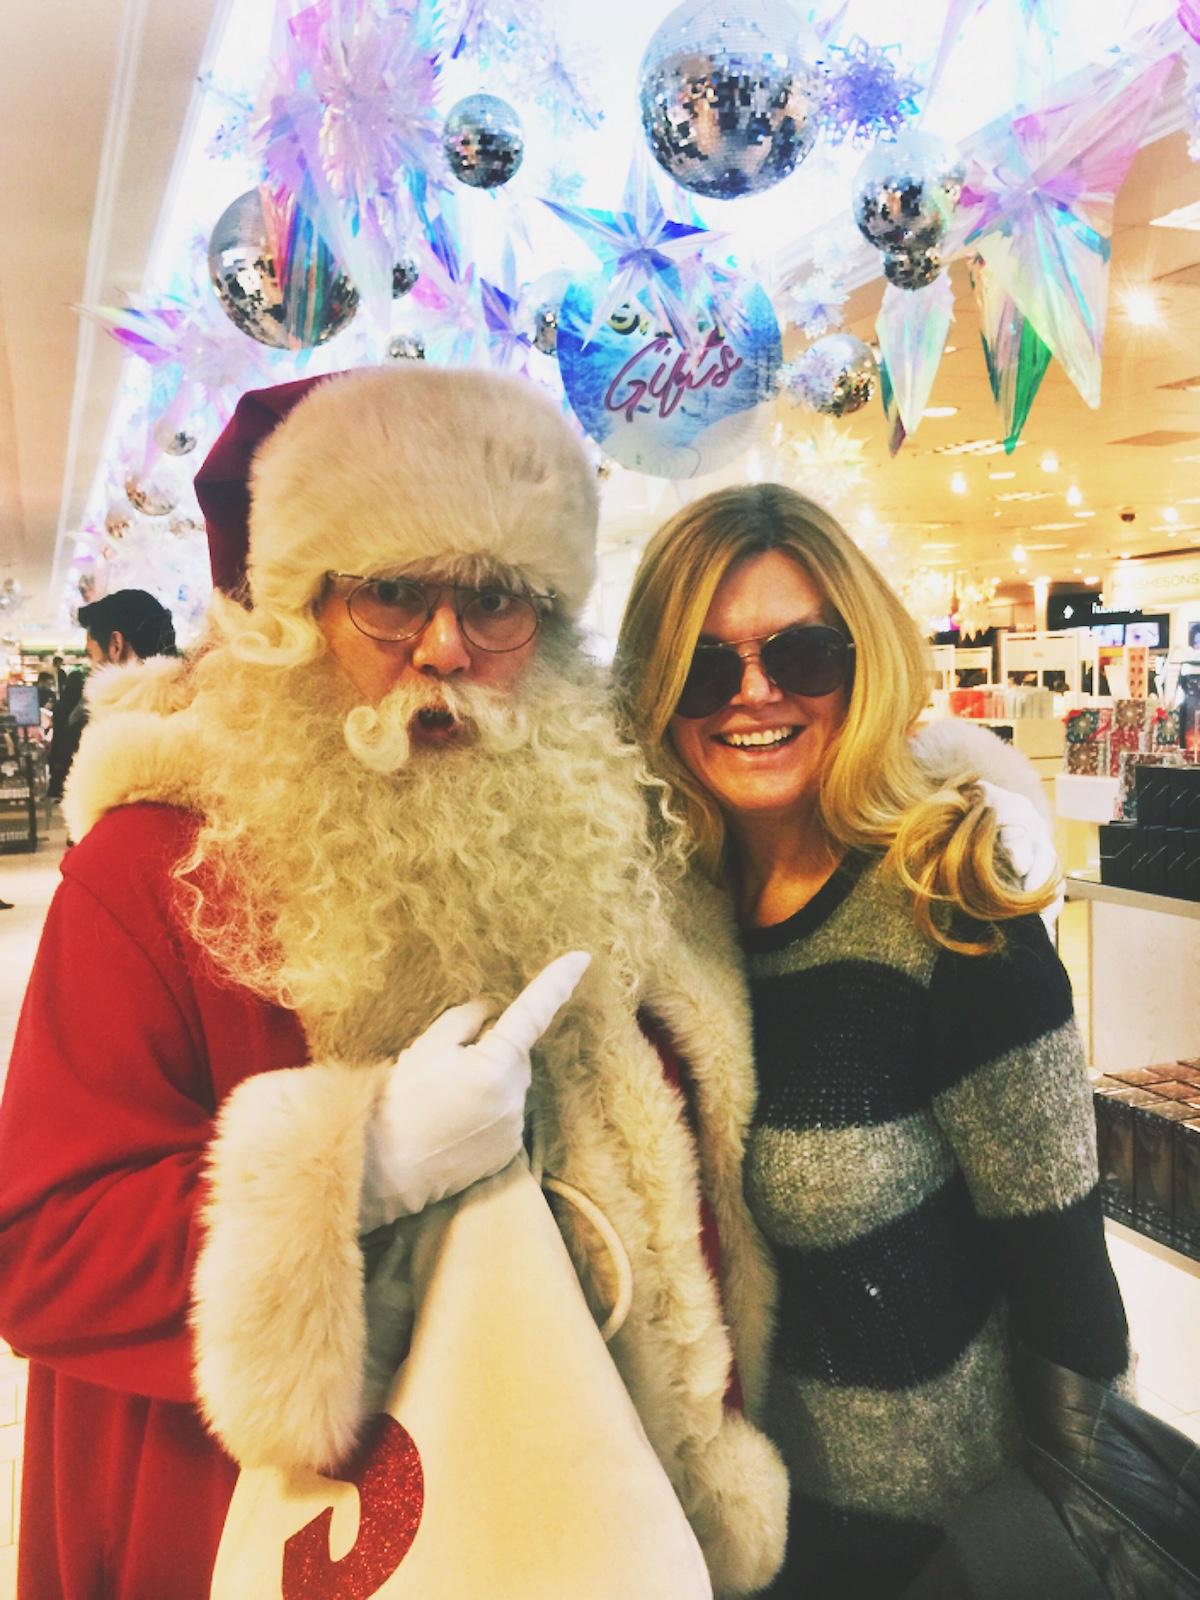 Abroad in London with Santa at Selfridge's